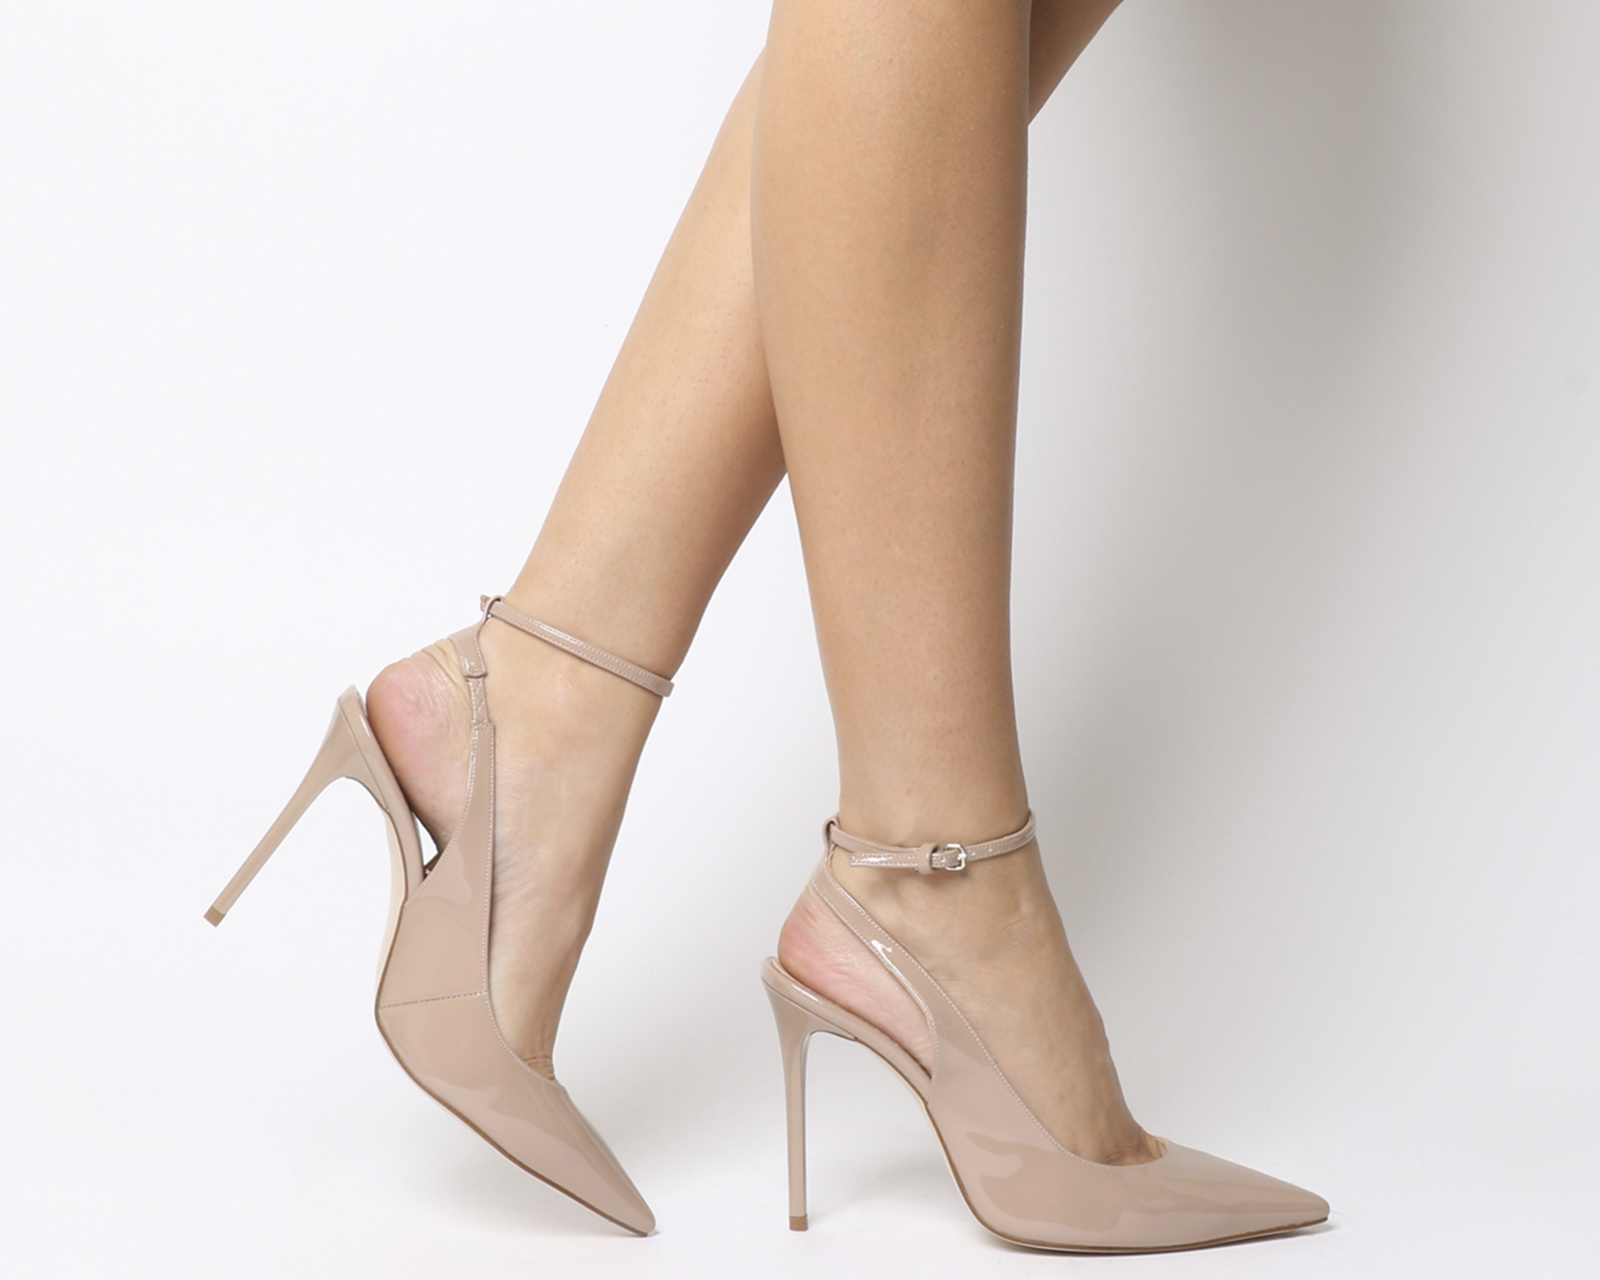 Sentinel Womens Office Hustler Ankle Strap Court Heels Nude Patent Heels